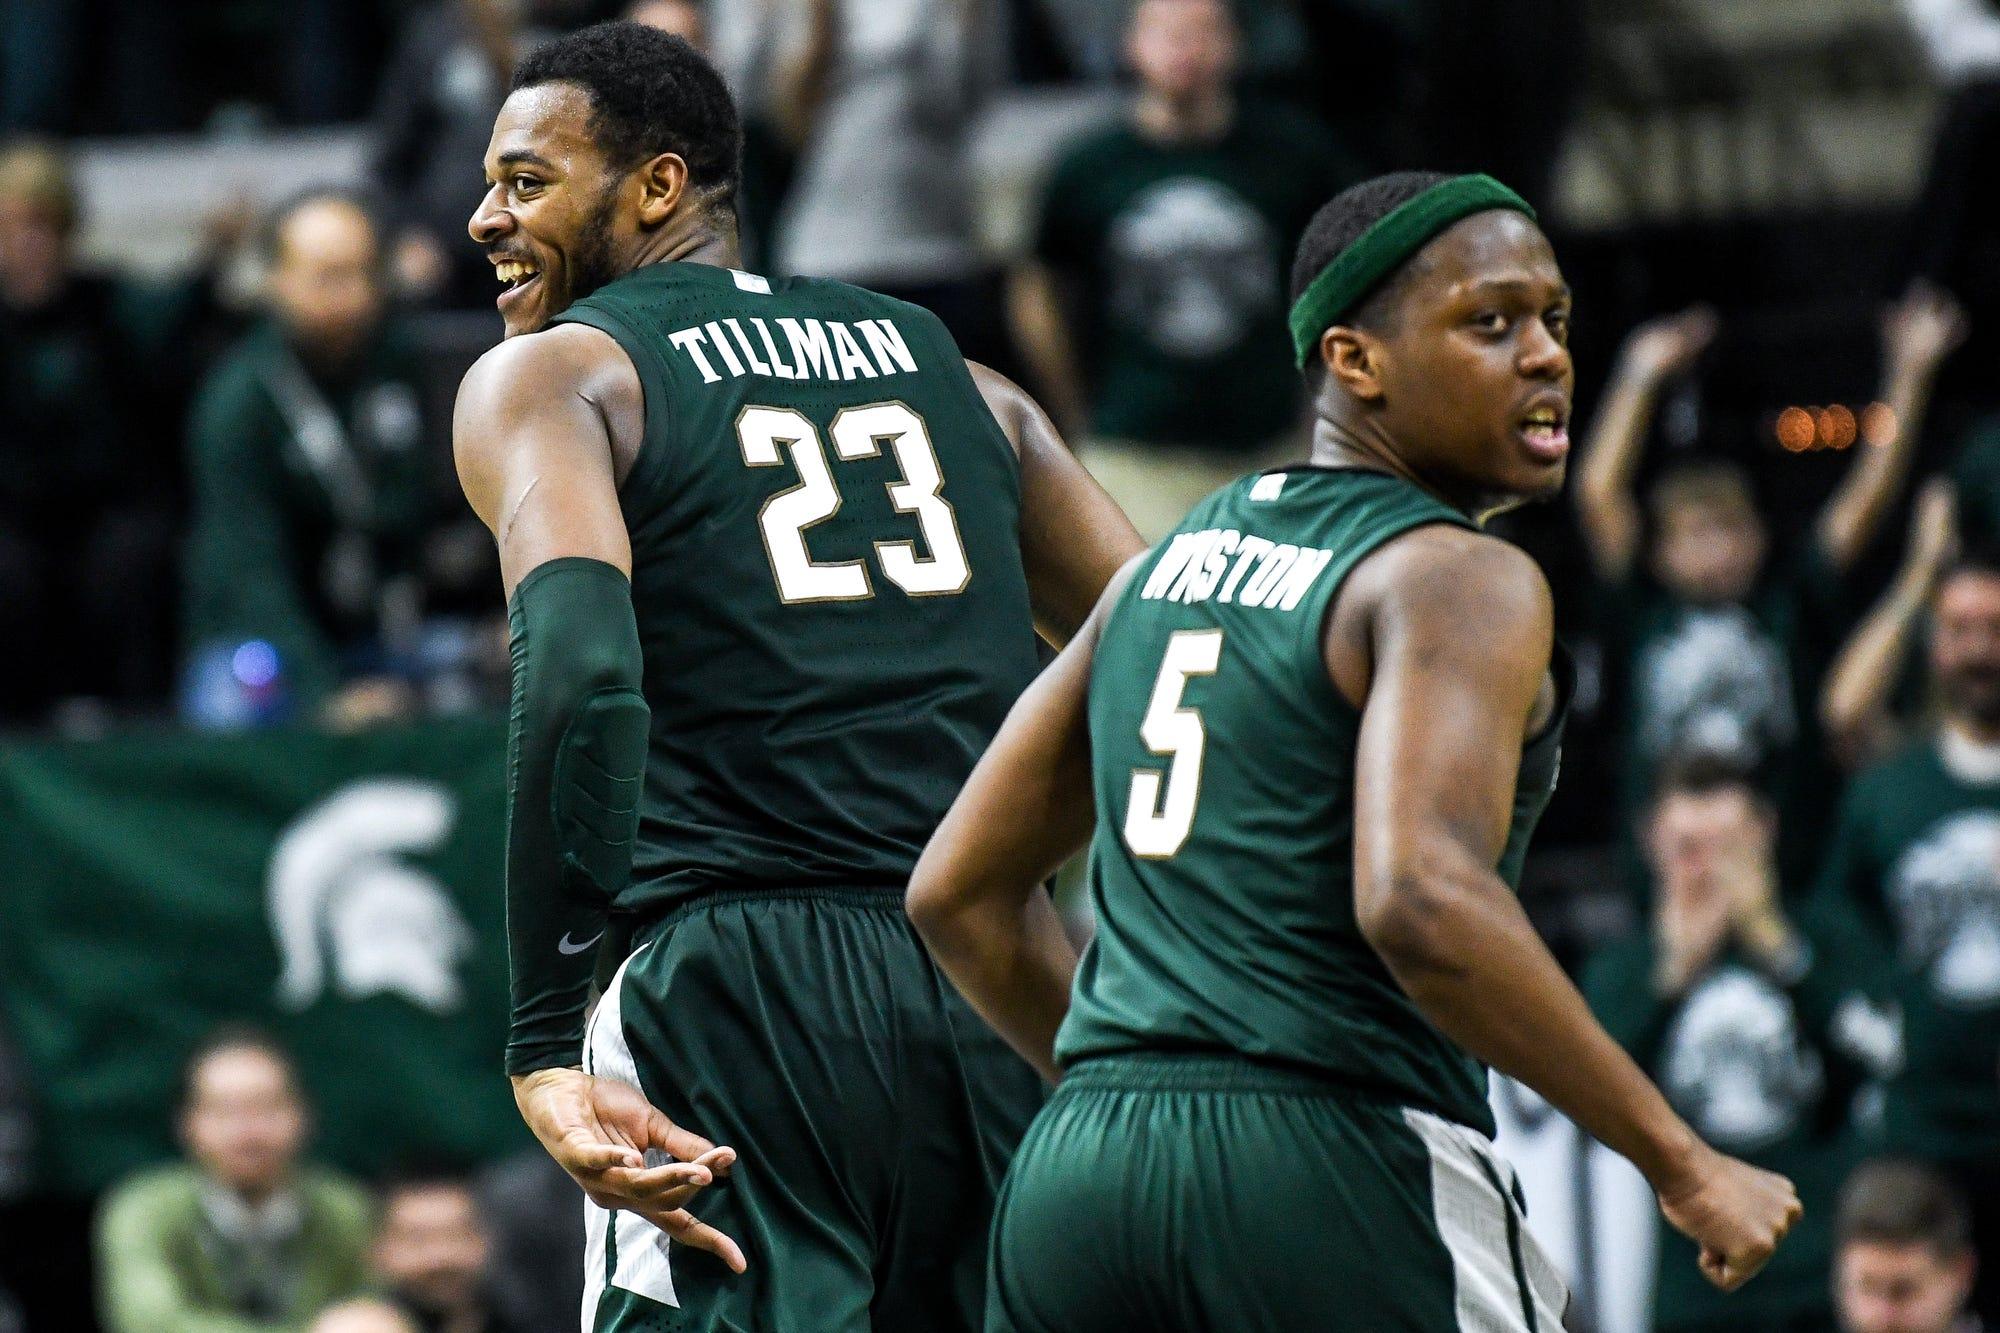 MSU basketball: Where Cassius Winston and Xavier Tillman rank all-time